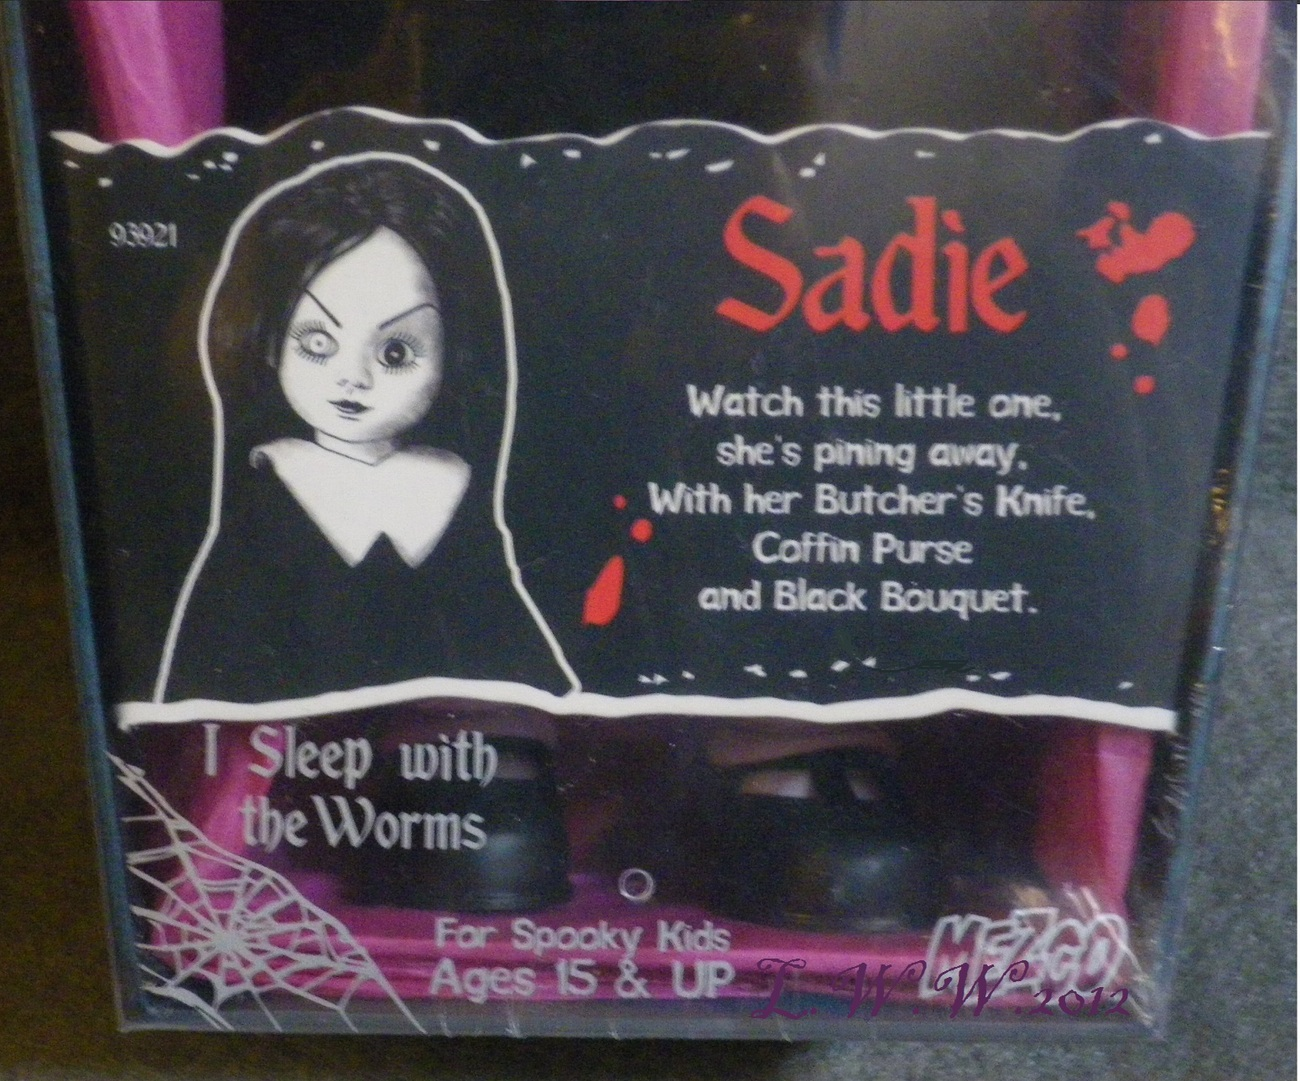 Living Dead Dolls Thirteenth Anniversary Series Sadie 13th Gothic Horror Mezco